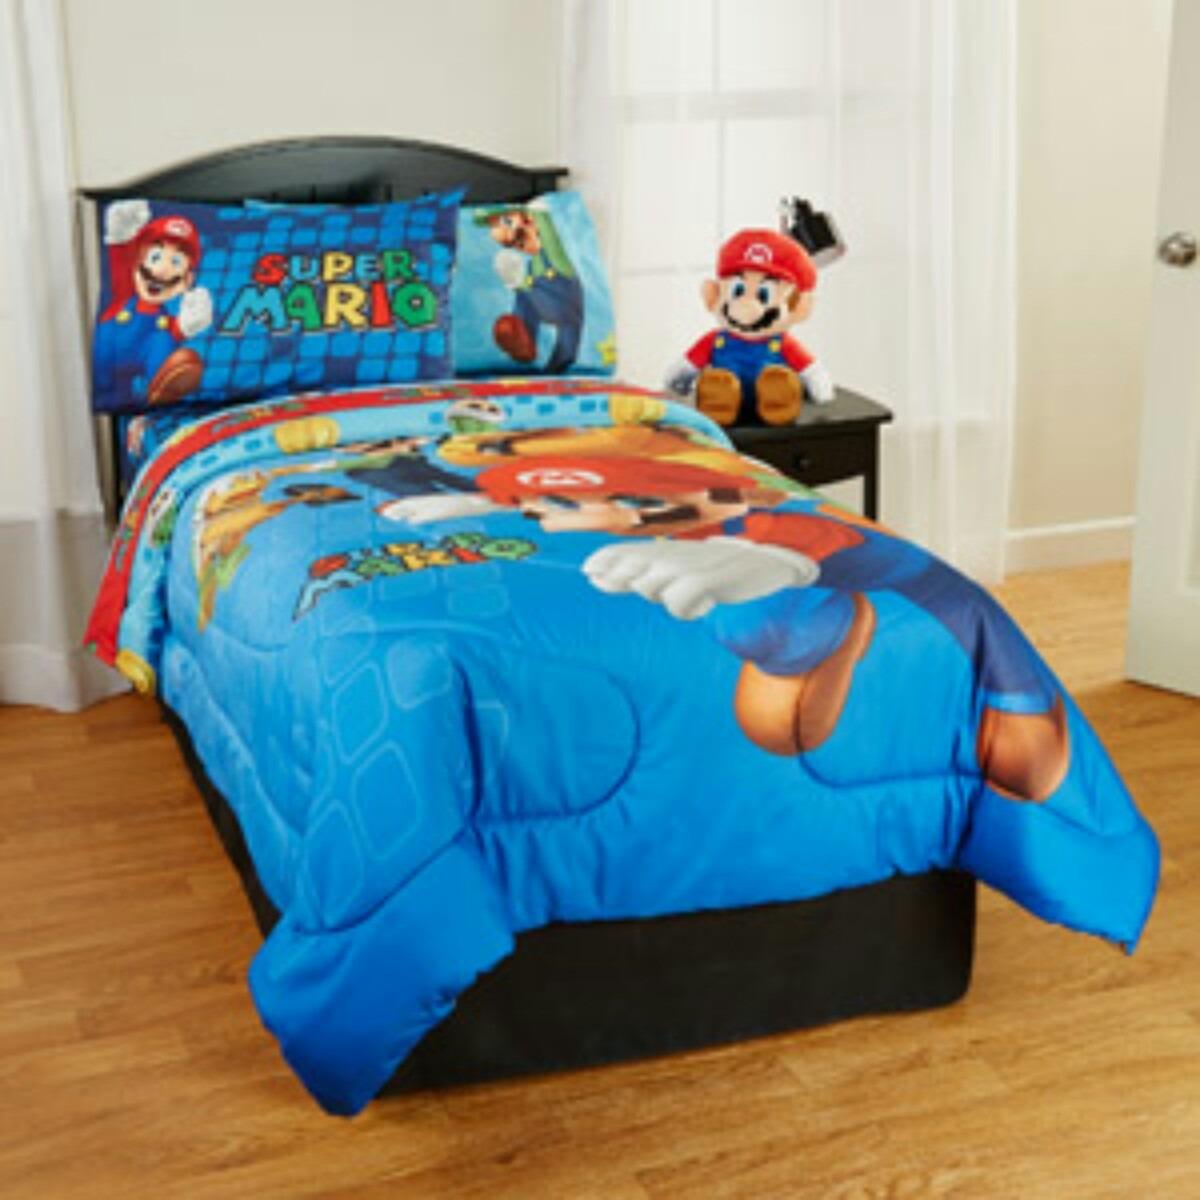 Set De Edredones Sonic, Minions, Lego City, Mario Bros